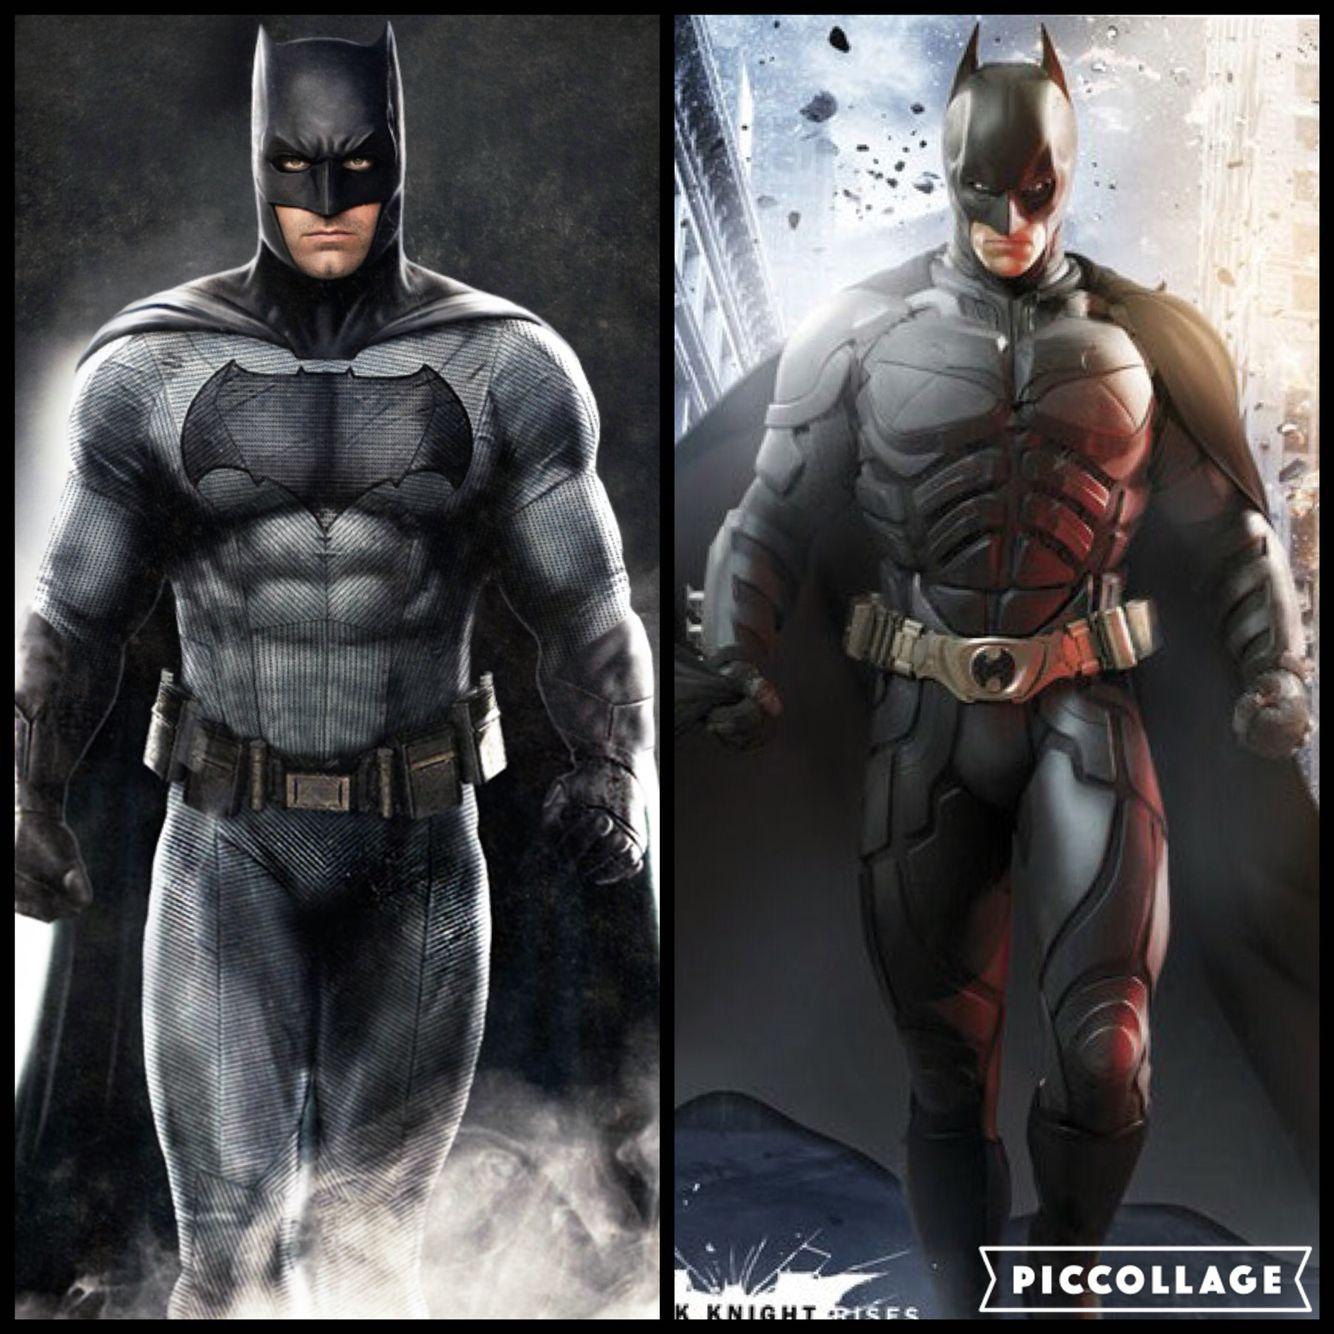 Batman Who Played Him Better Ben Affleck Or Christian Bale Batman Batman Universe Superhero